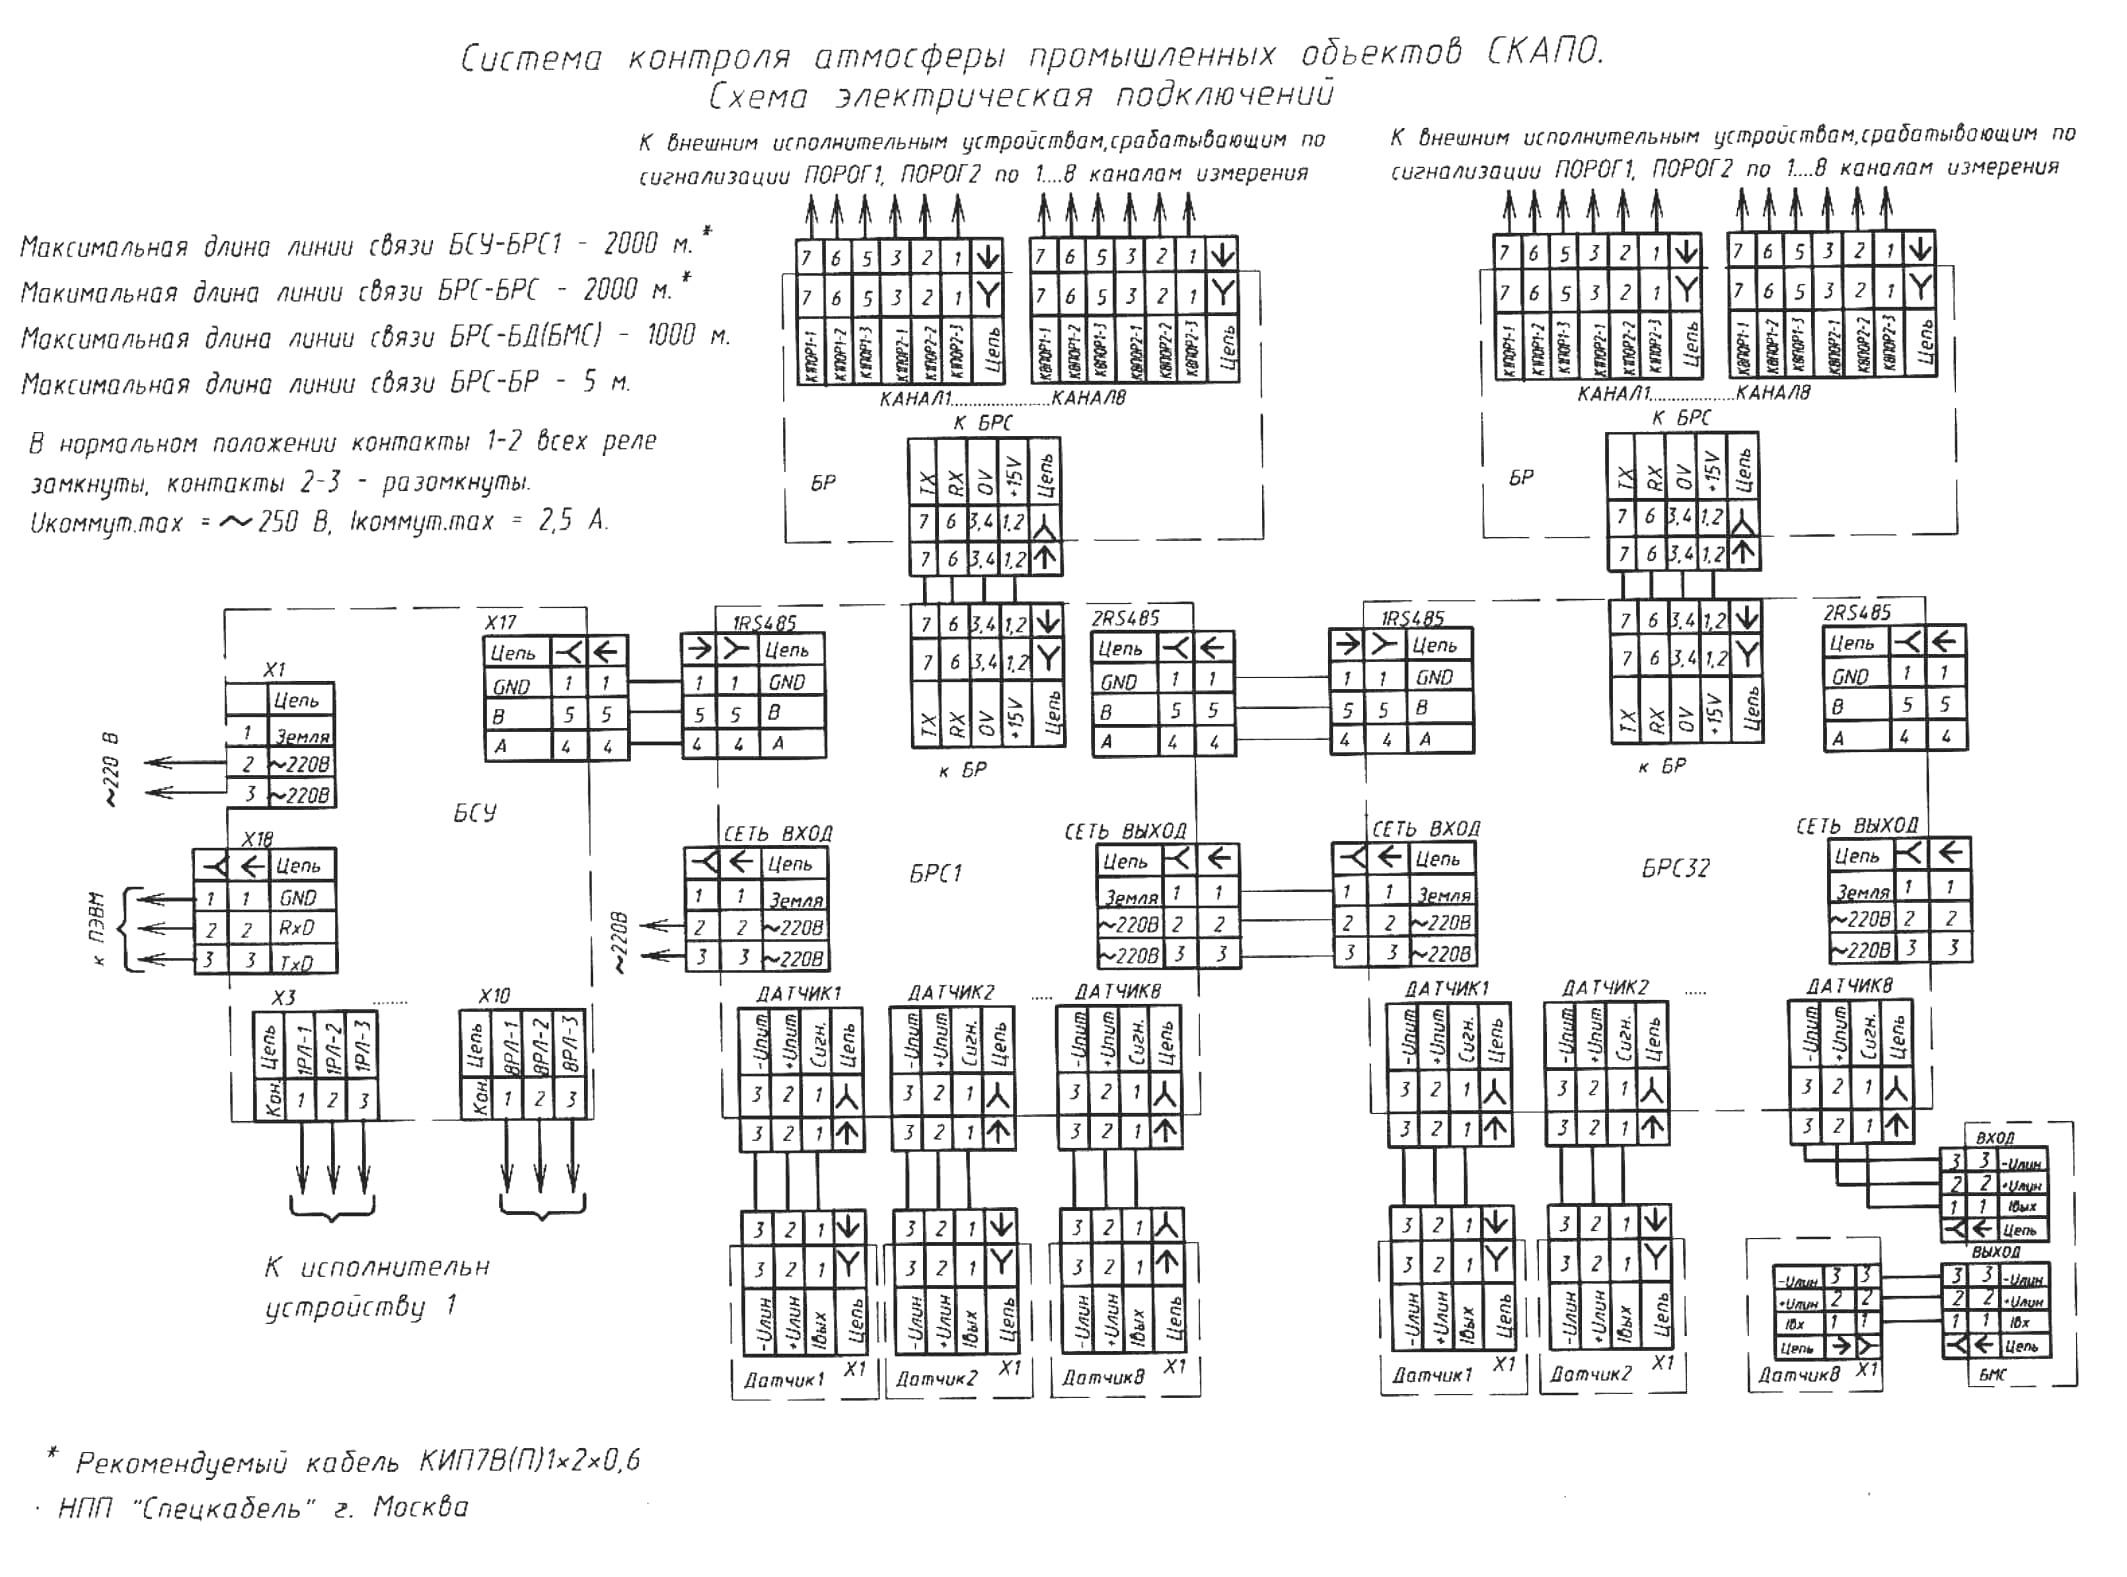 инструкция сакз-мк-2